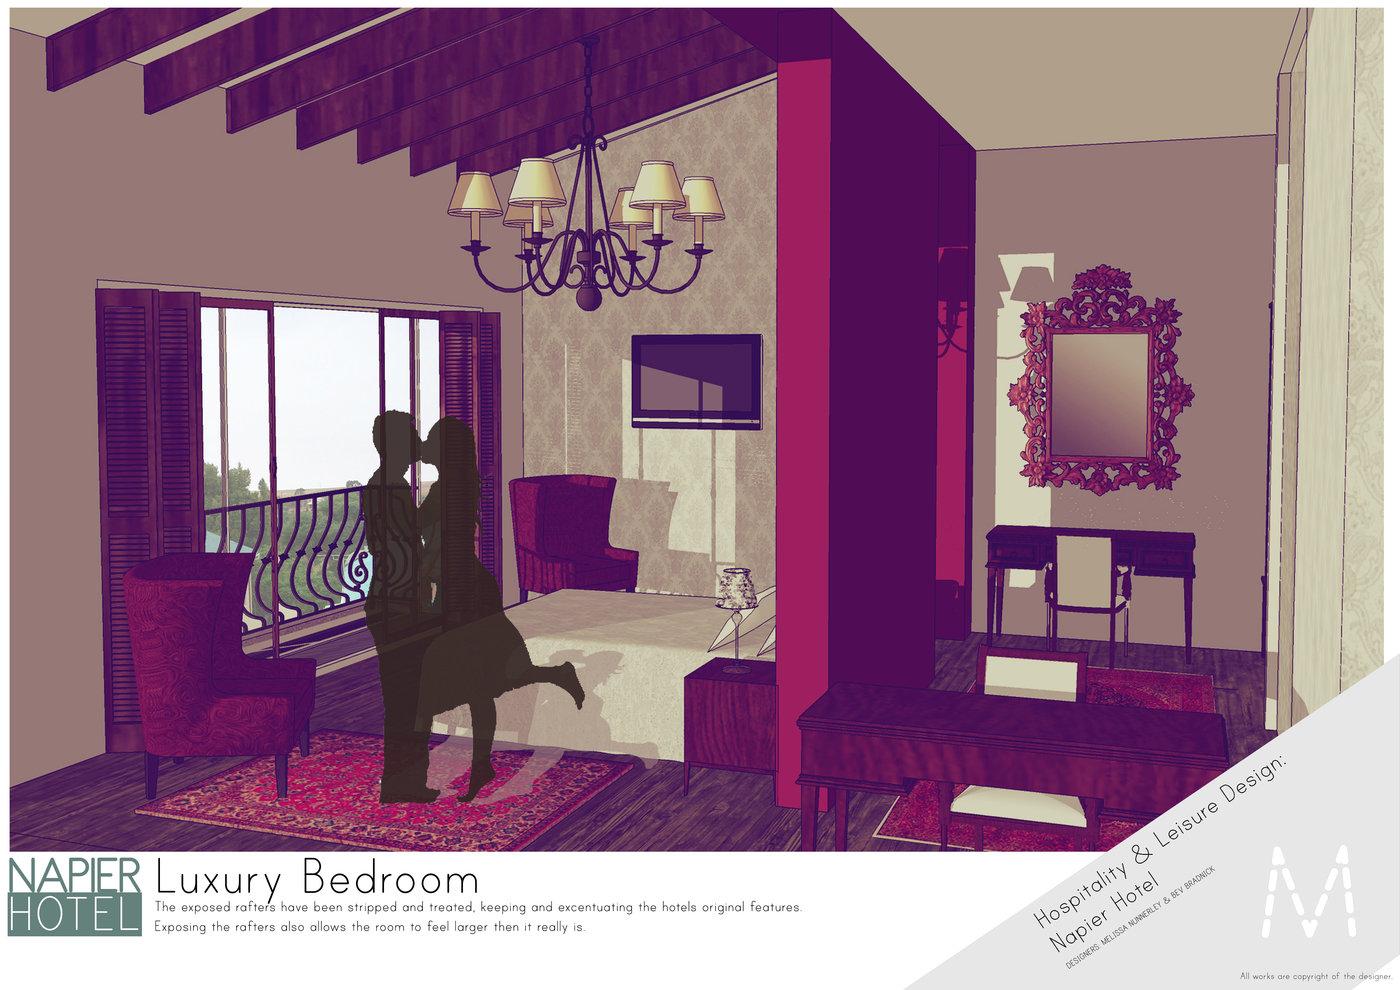 Hospitality & Leisure Design- Napier Hotel by Melissa